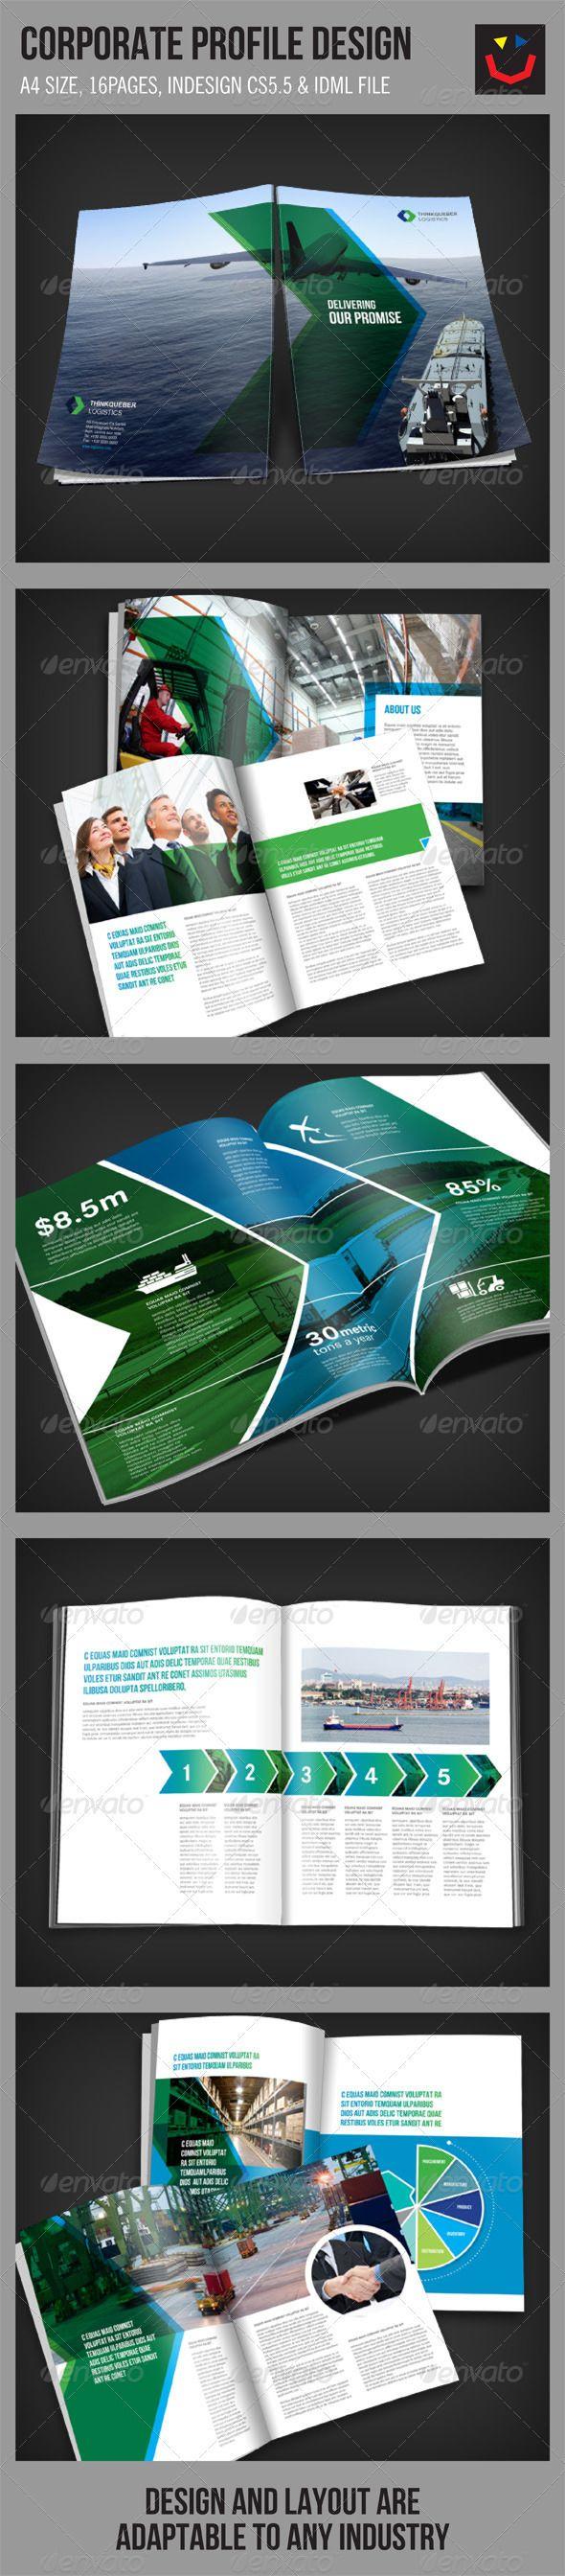 Corporate Brochure Design  Brochures Template And Corporate